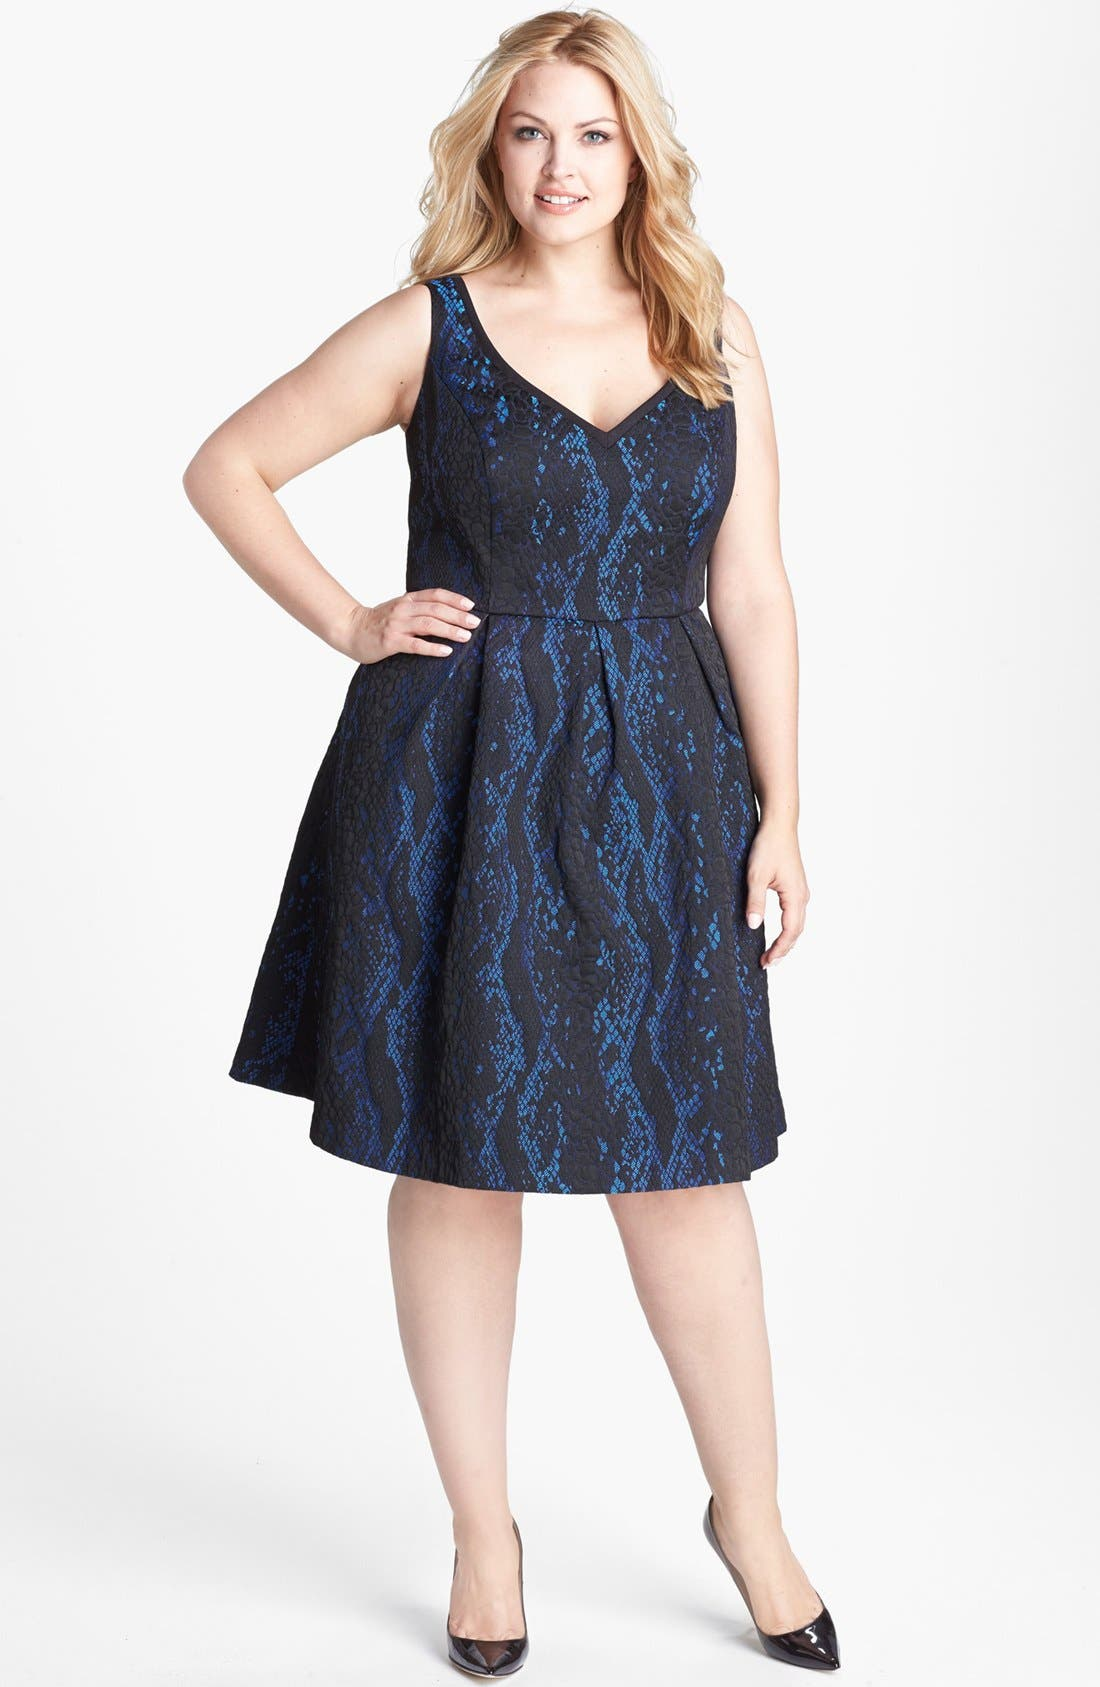 Alternate Image 1 Selected - ABS by Allen Schwartz Python Jacquard Cocktail Dress (Plus Size)